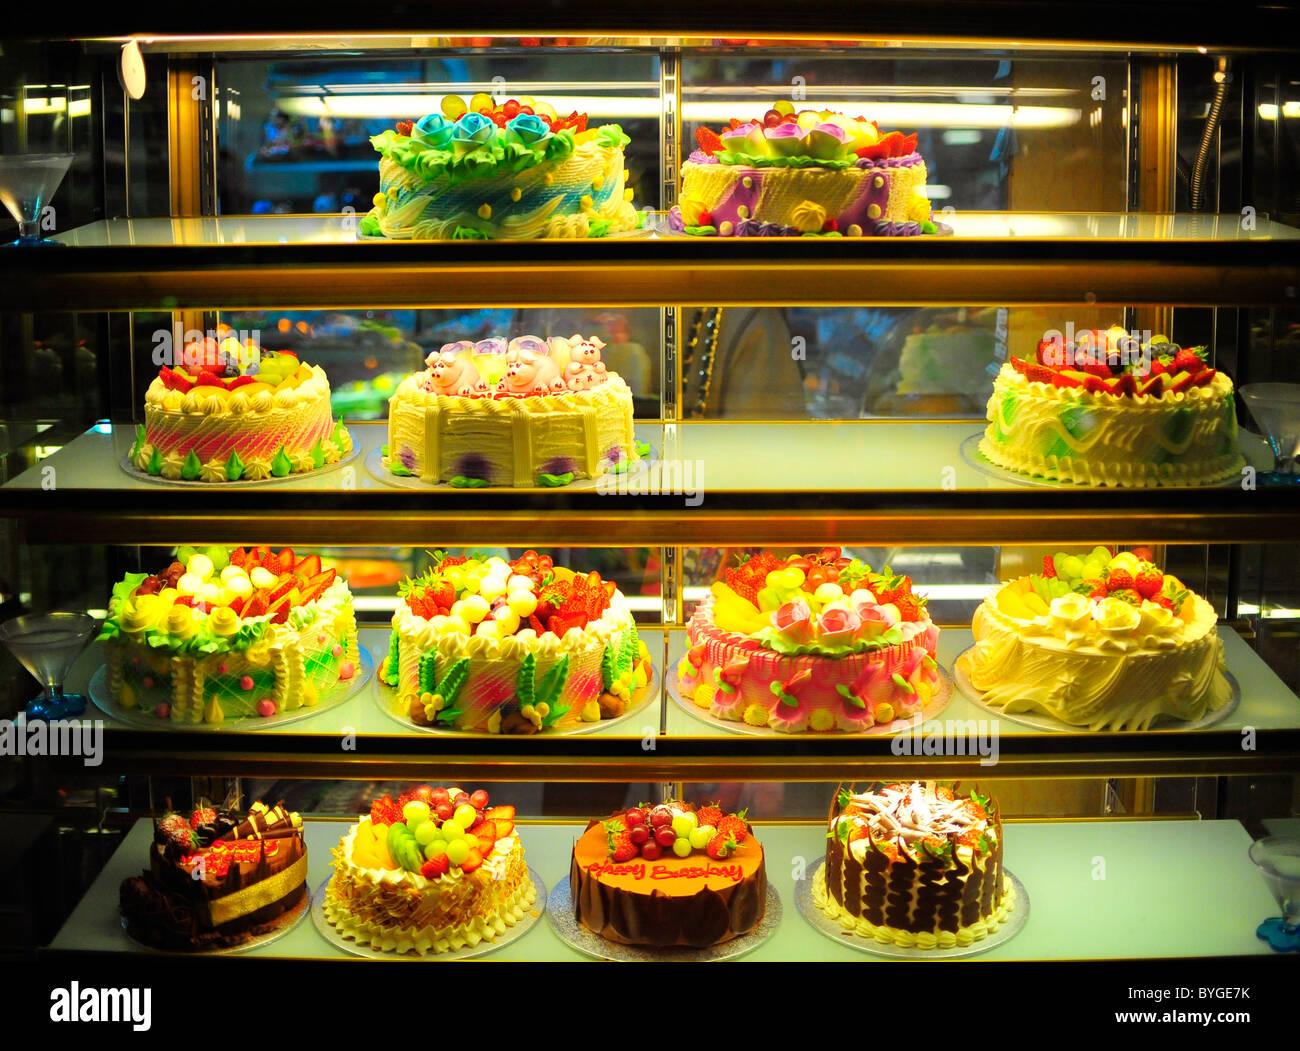 Chinese Cake Shop Stock Photos & Chinese Cake Shop Stock Images - Alamy